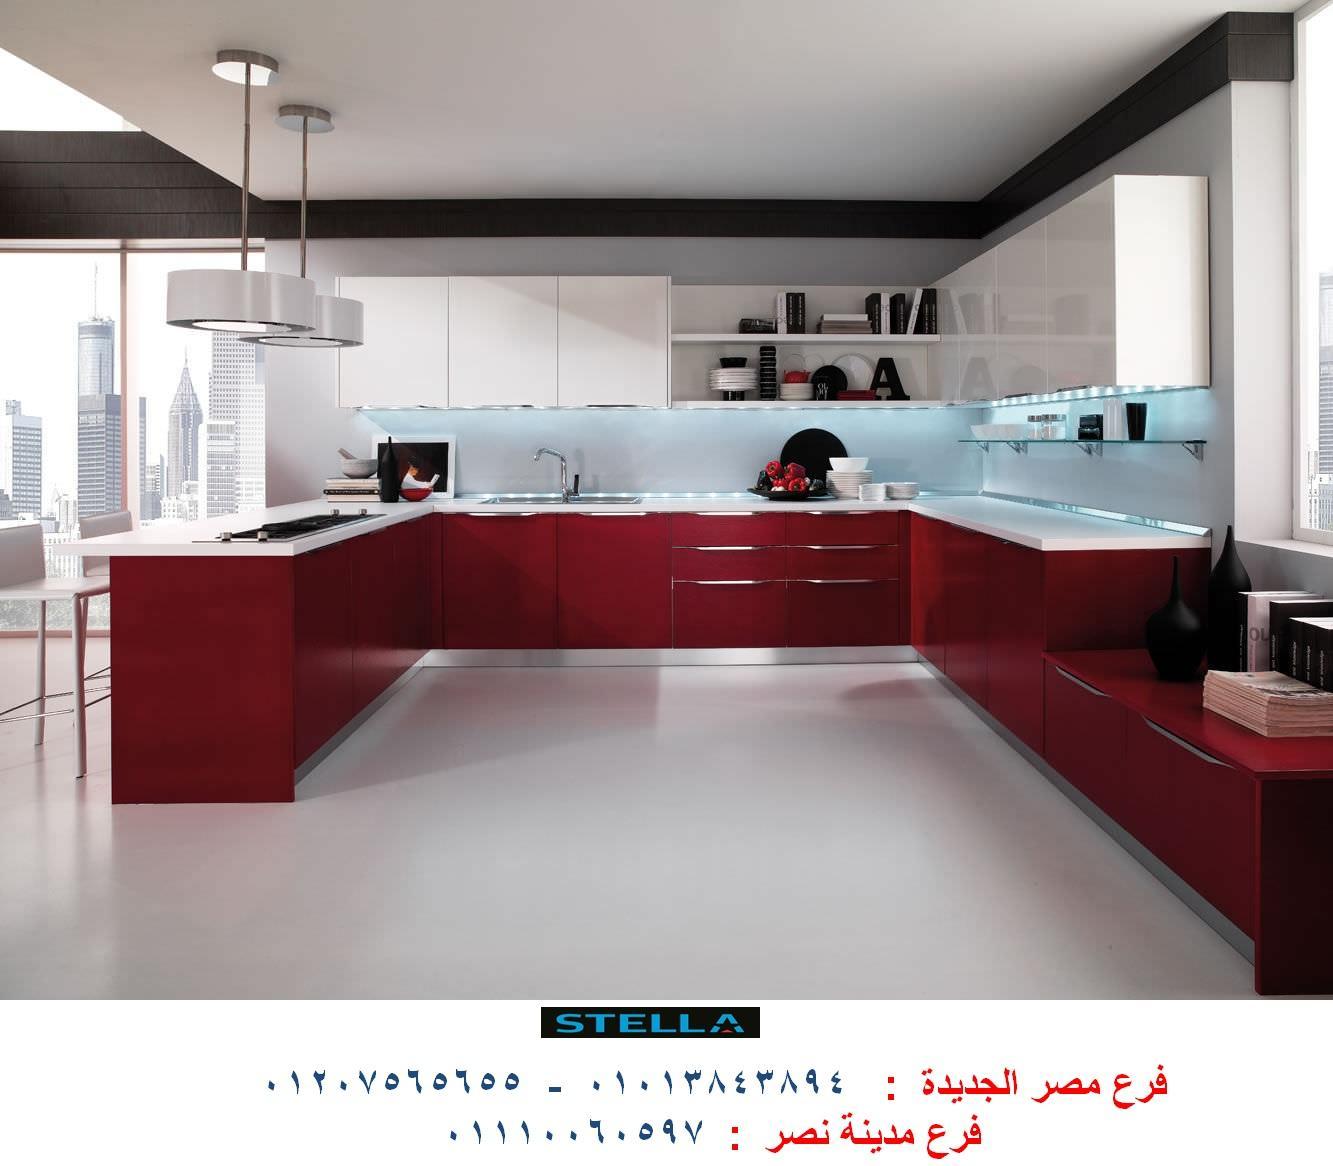 مطابخ اكريليك بافضل سعر فى مصر    01207565655 977421399